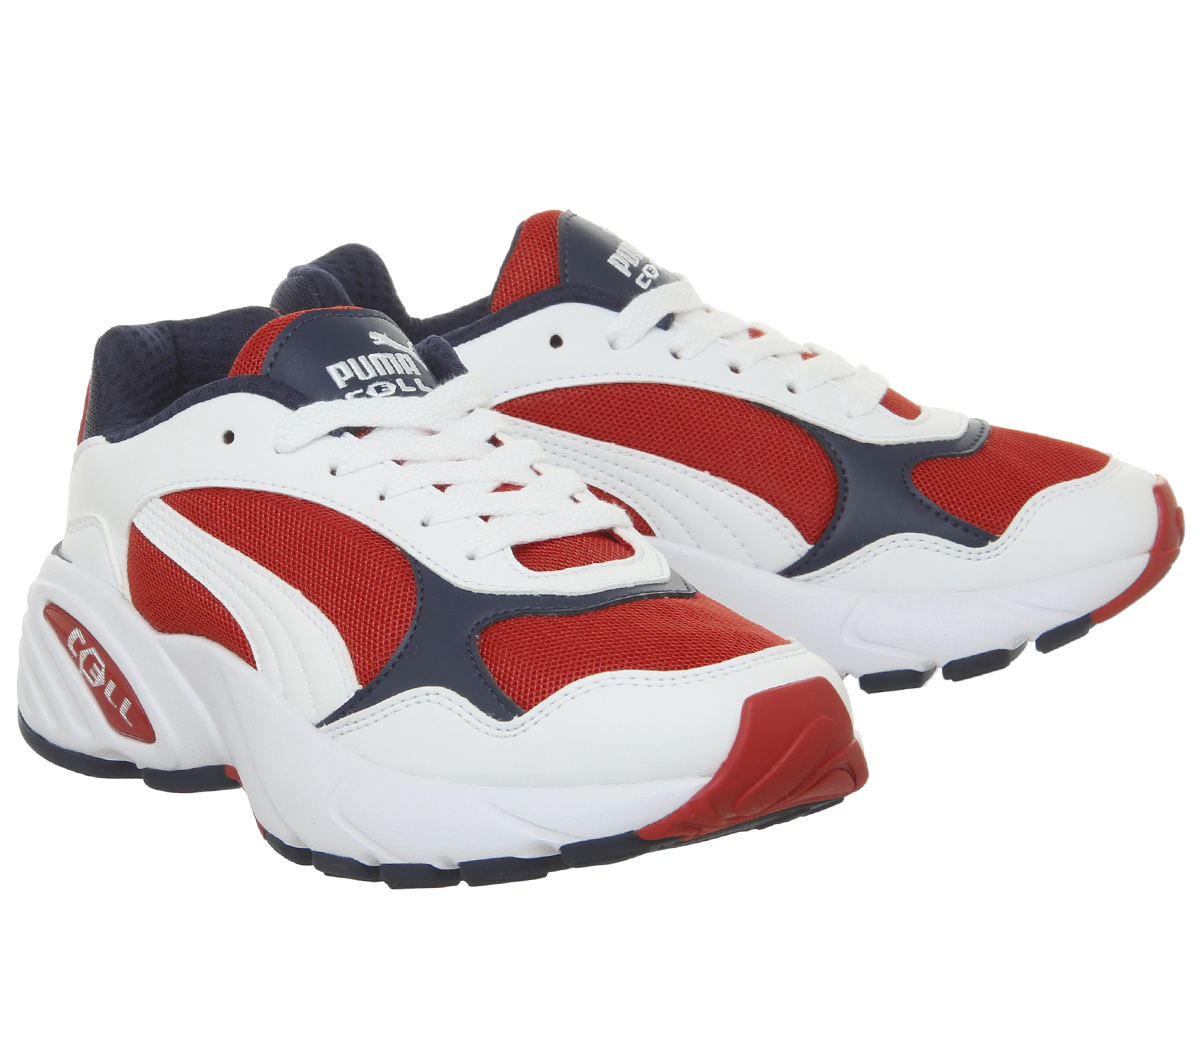 Homme-Puma-Cell-Viper-Baskets-PUMA-blanc-Risque-Eleve-Rouge-Baskets miniature 12